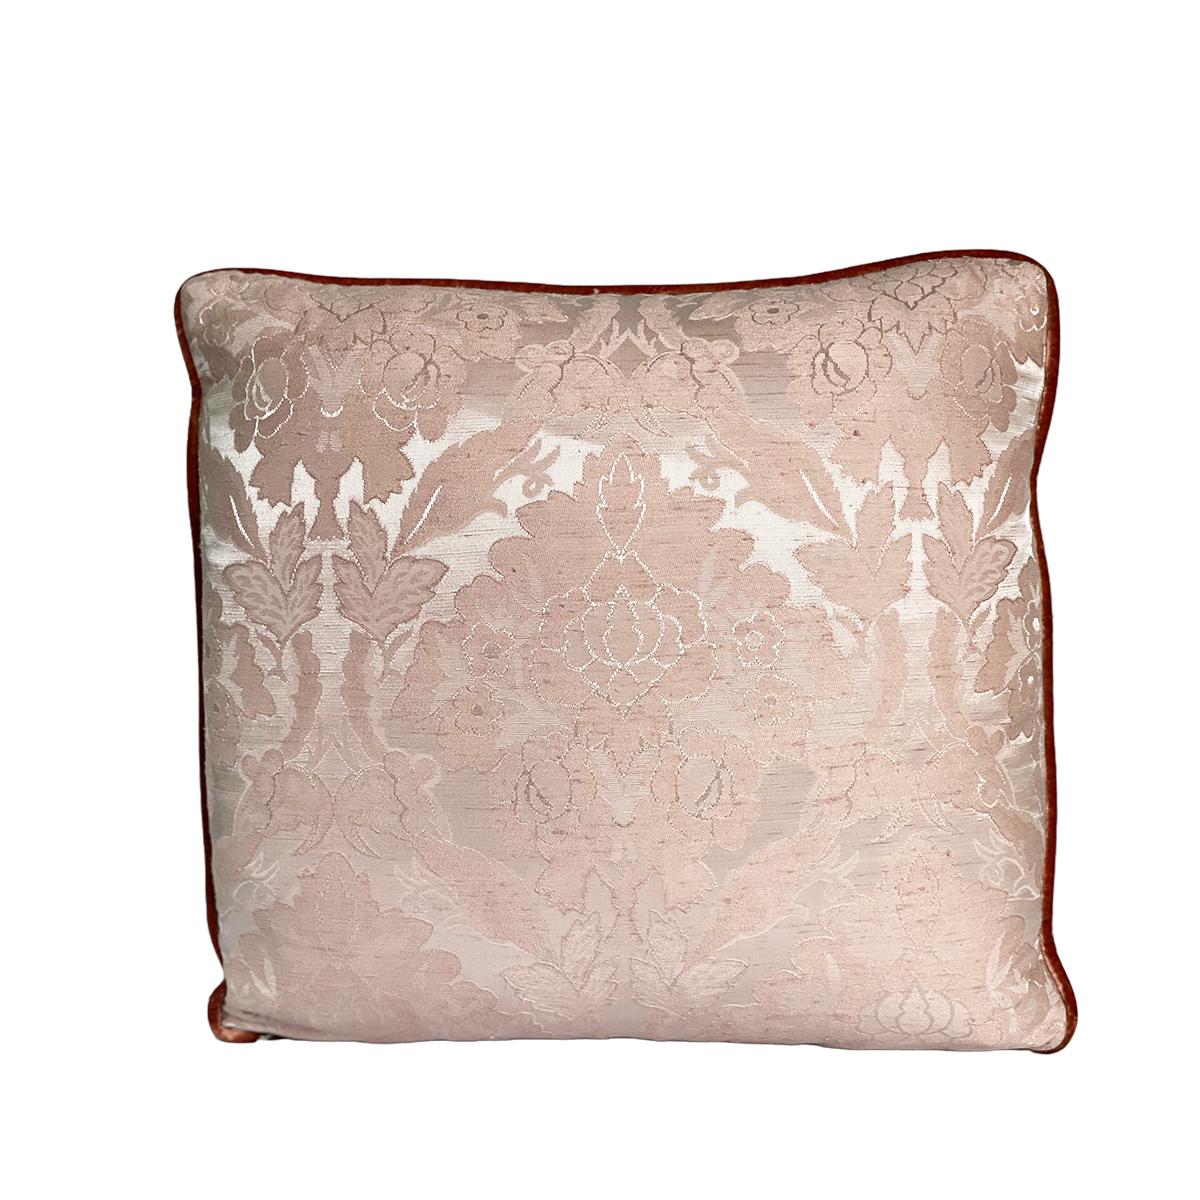 Flower Garden – Single Pillow 18 x 18, Pair available